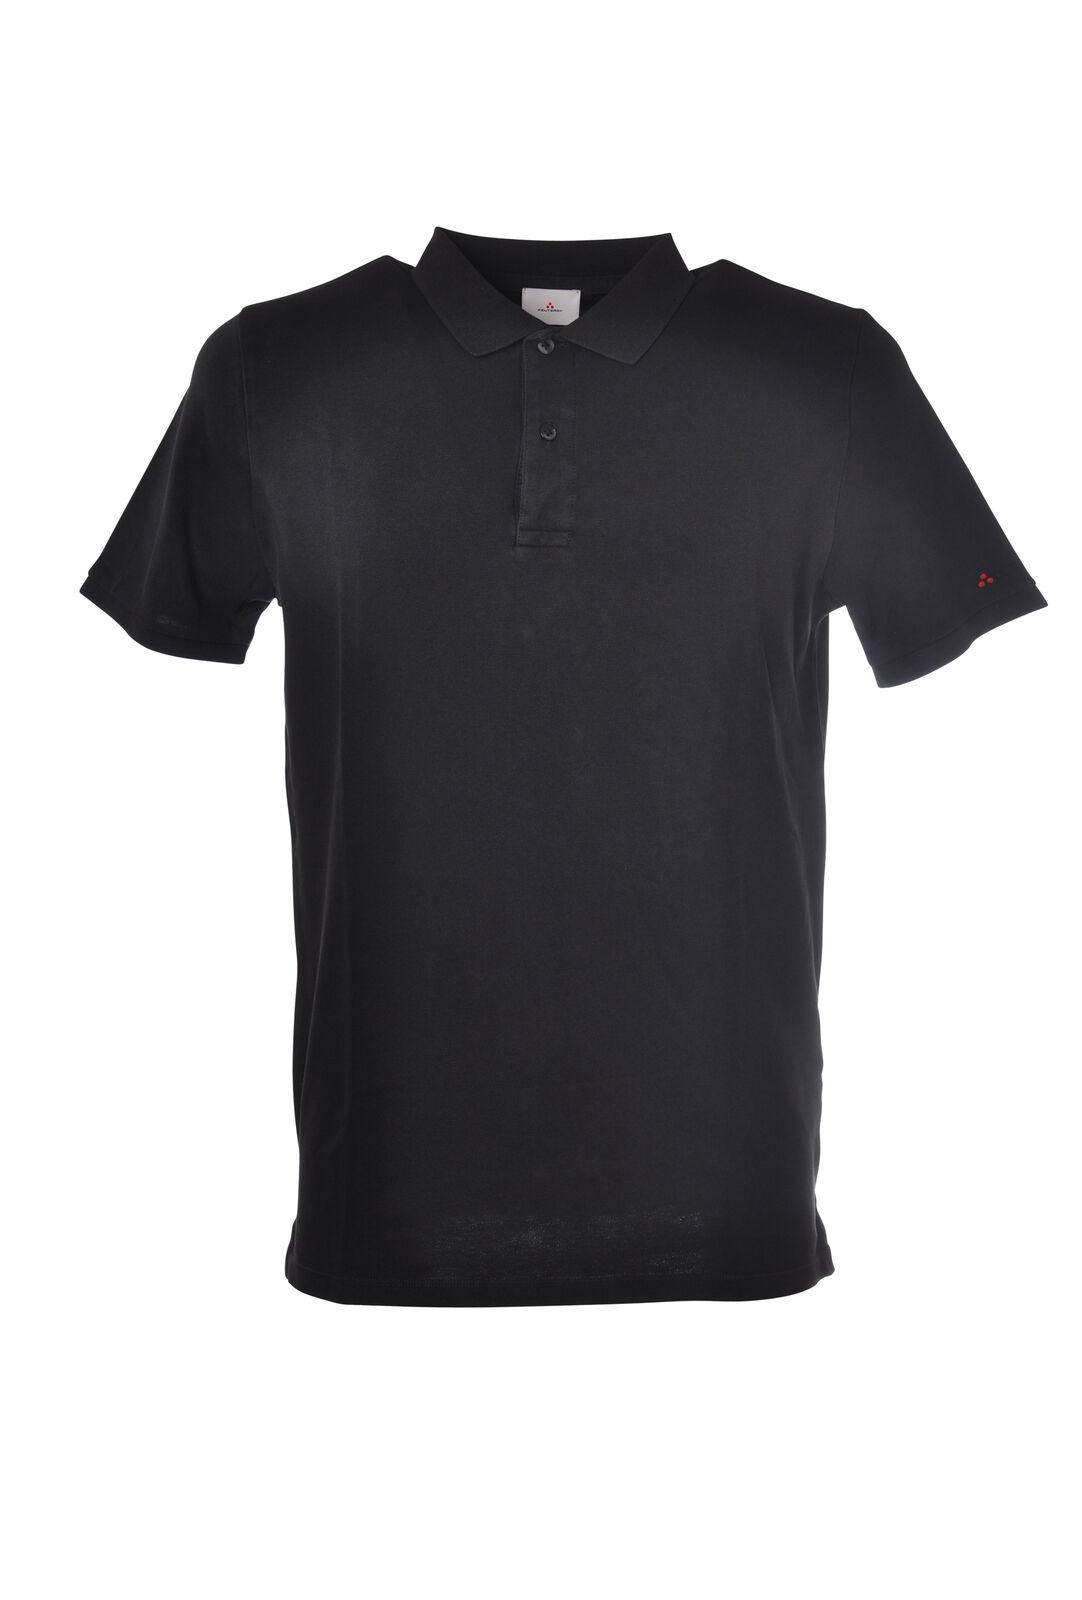 Peuterey - Topwear-Polo - Man - bluee - 5324308F184704